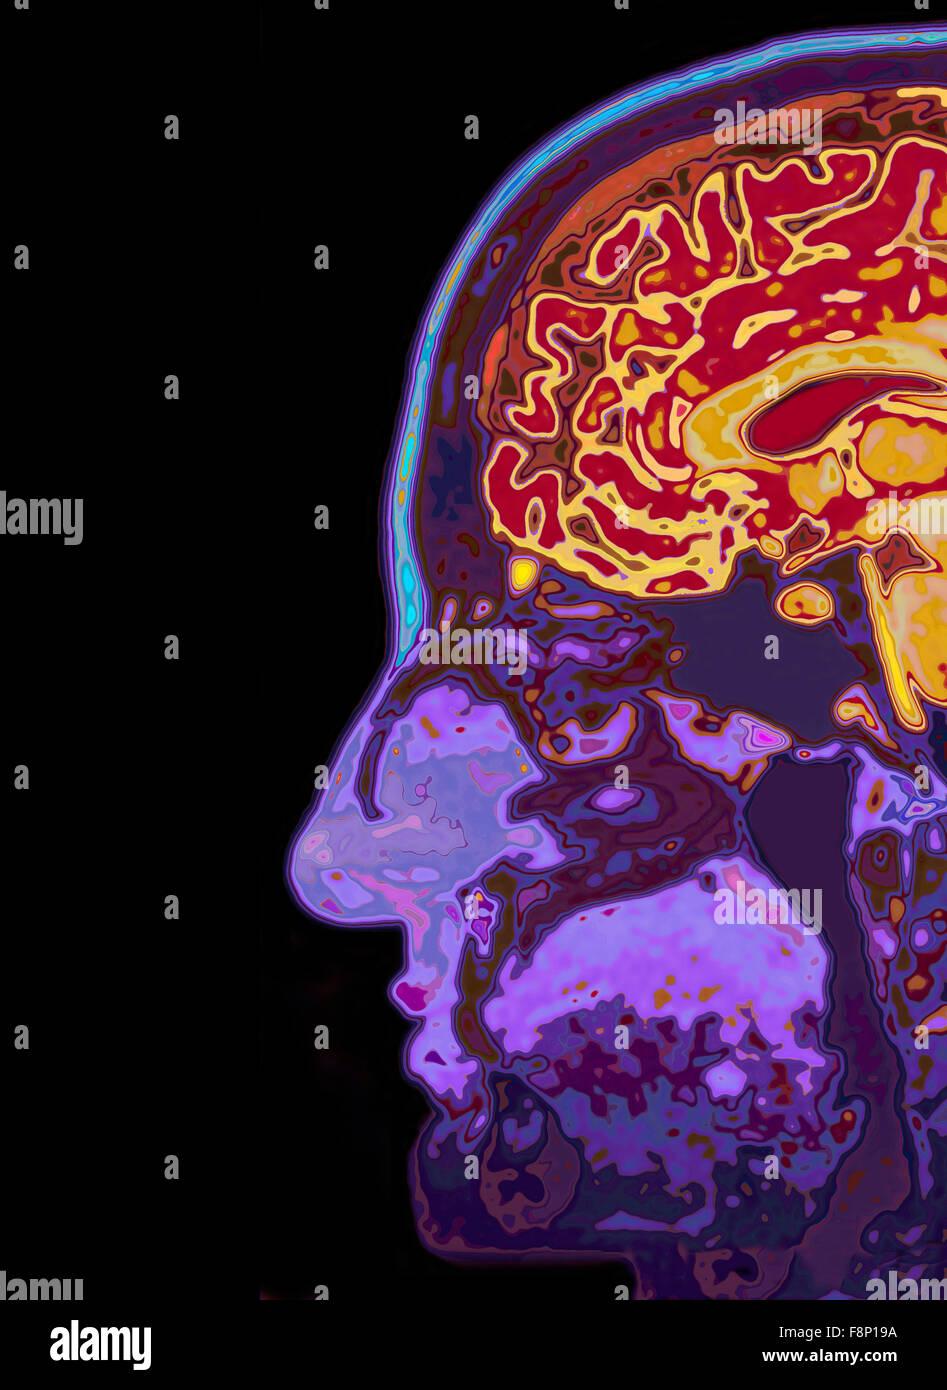 Mri Image Head Showing Brain Stockfotos & Mri Image Head Showing ...